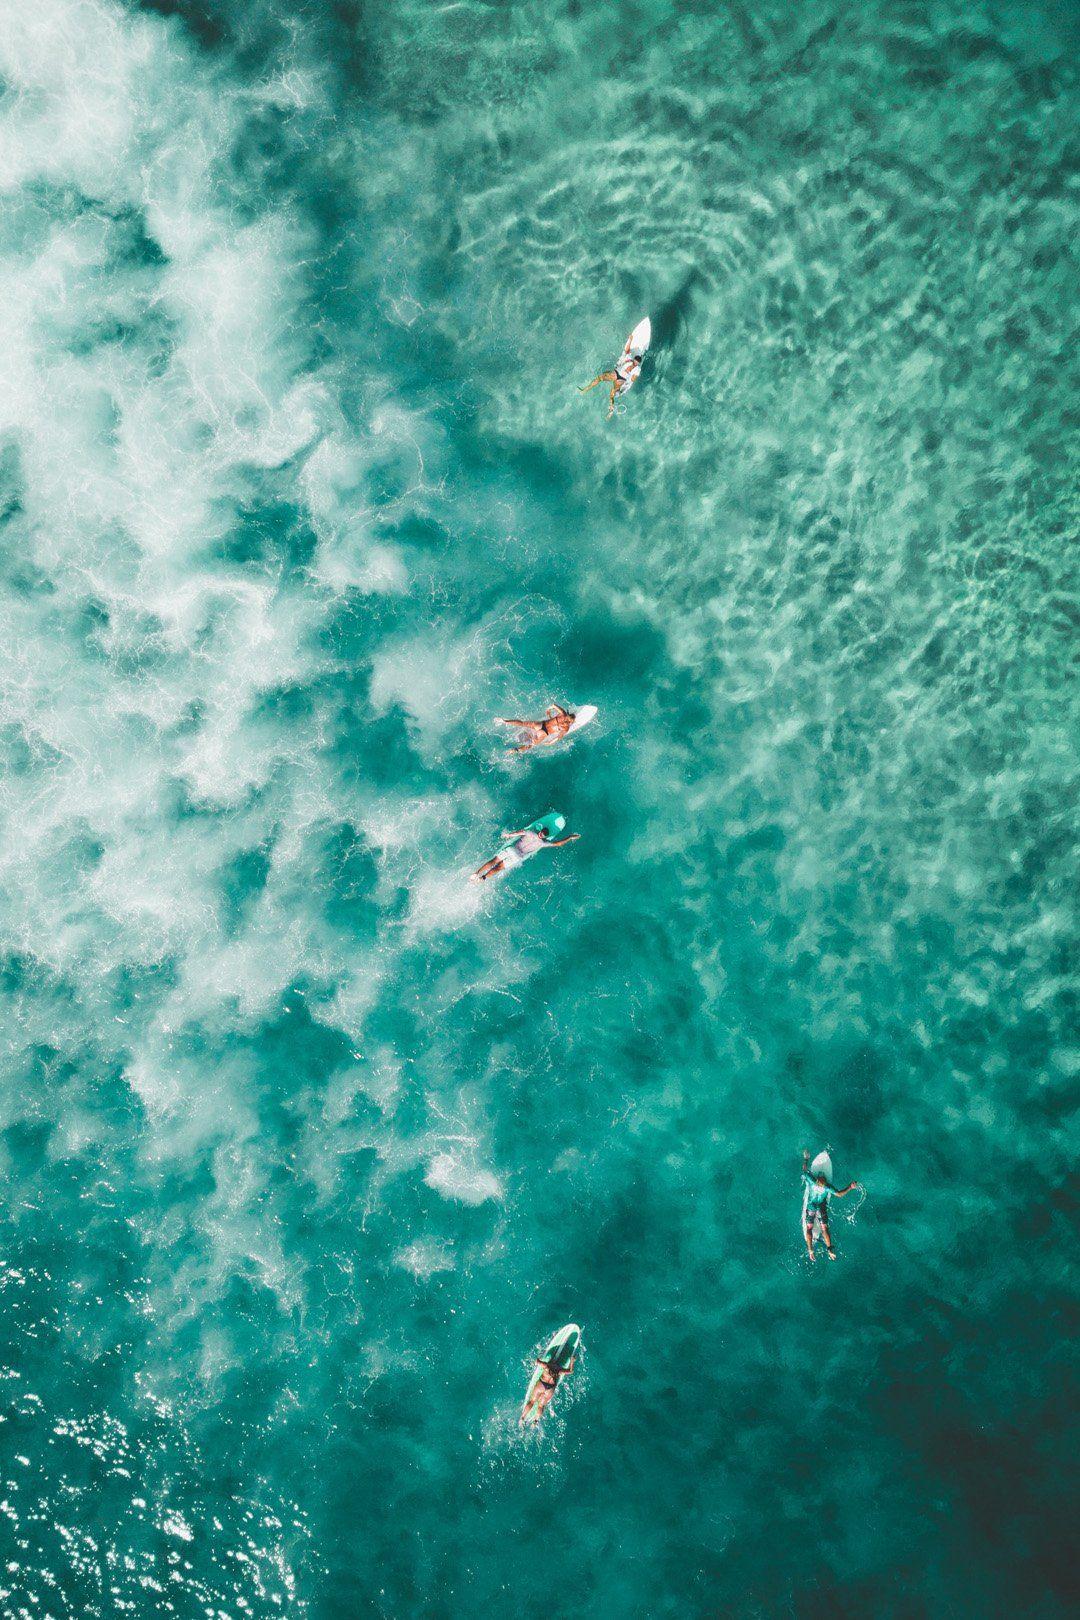 Pin By Ashley Beckschebe On Hintergrunde In 2020 Beach Wallpaper Beach Background Ocean Iphone